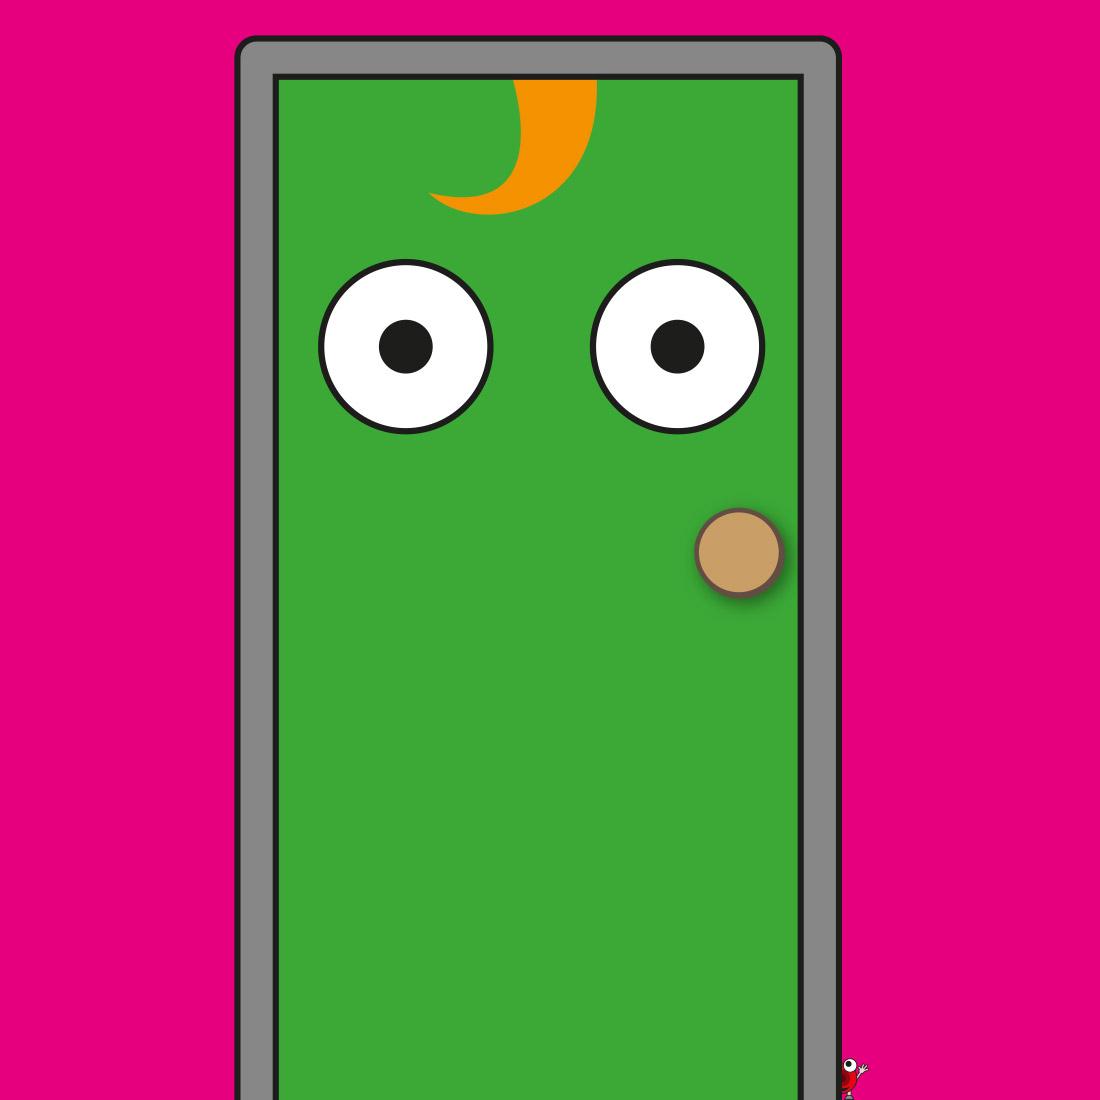 R and Q Character - Door